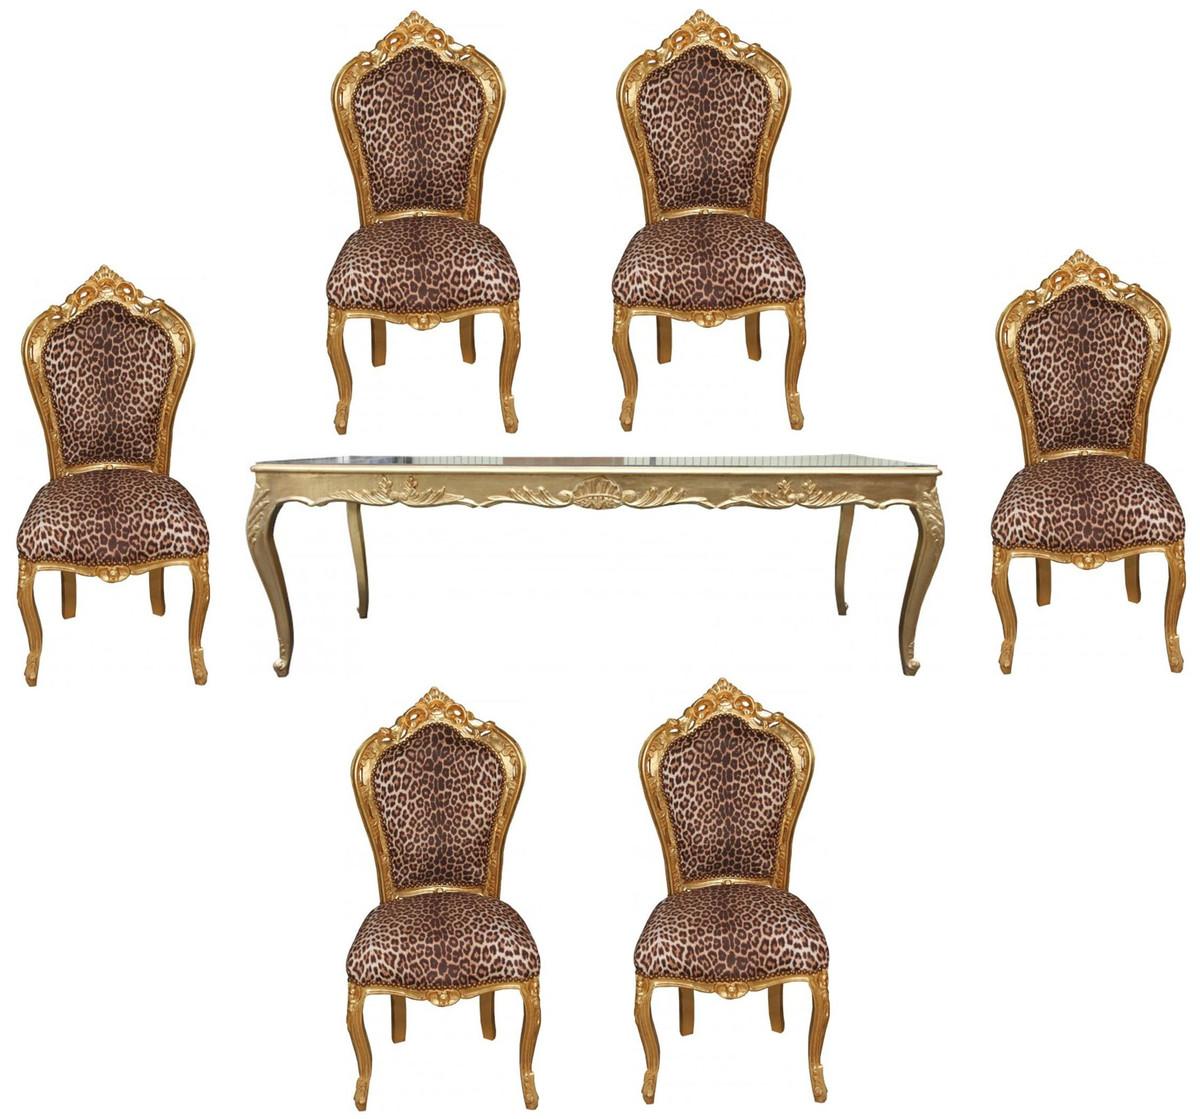 casa padrino barock esszimmer set leopard gold esstisch 6 st hle ohne armlehnen esszimmer sets. Black Bedroom Furniture Sets. Home Design Ideas